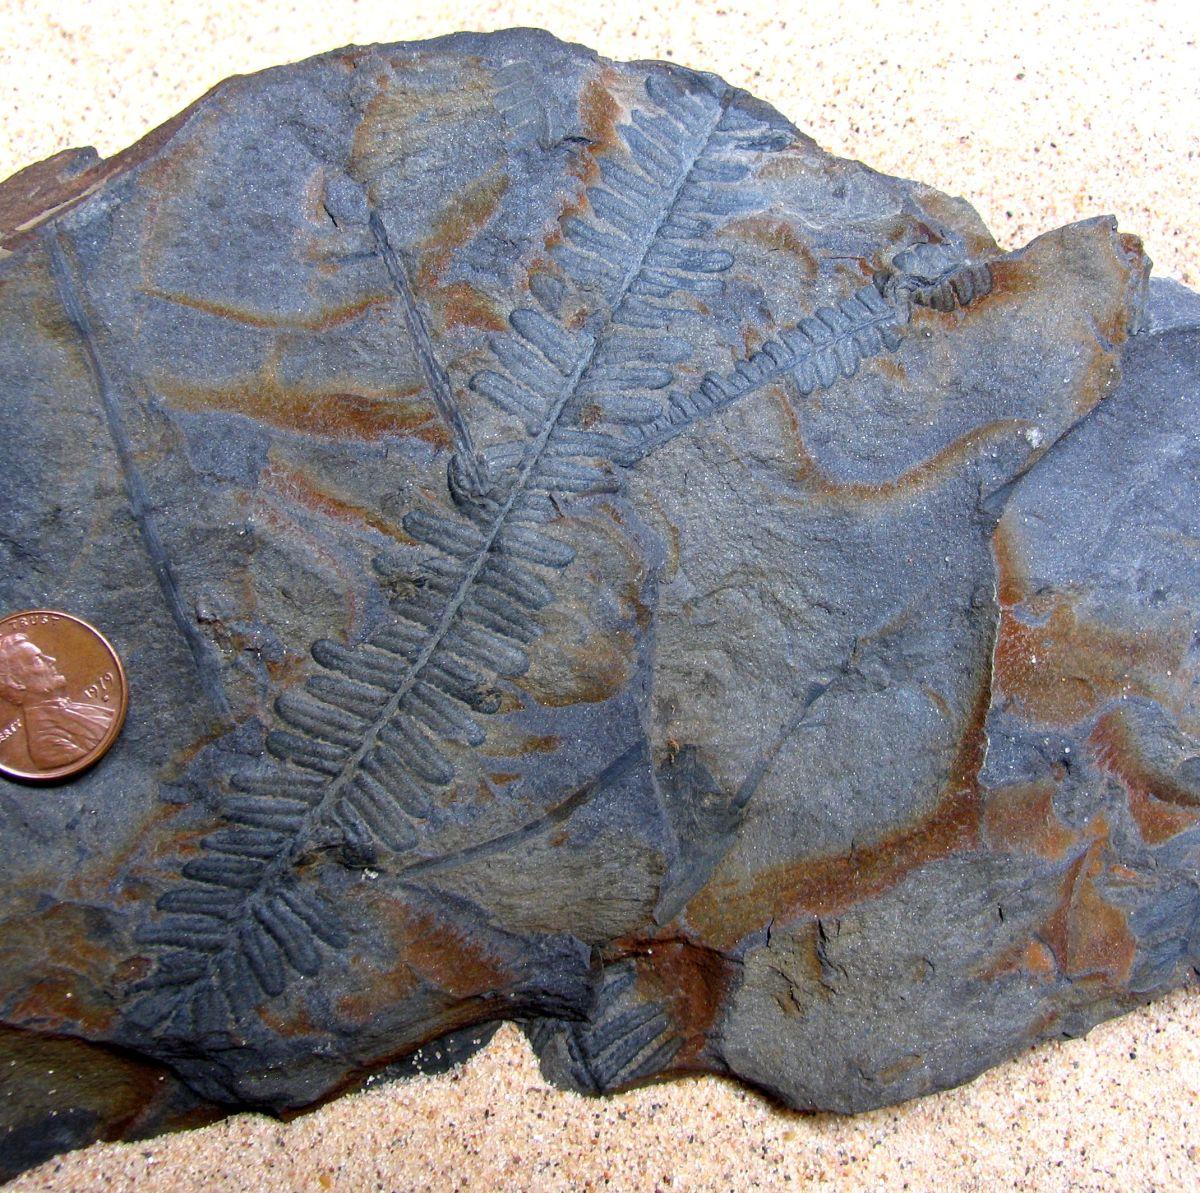 PECOPTERIS LEAVES OF PSARONIUS TREE